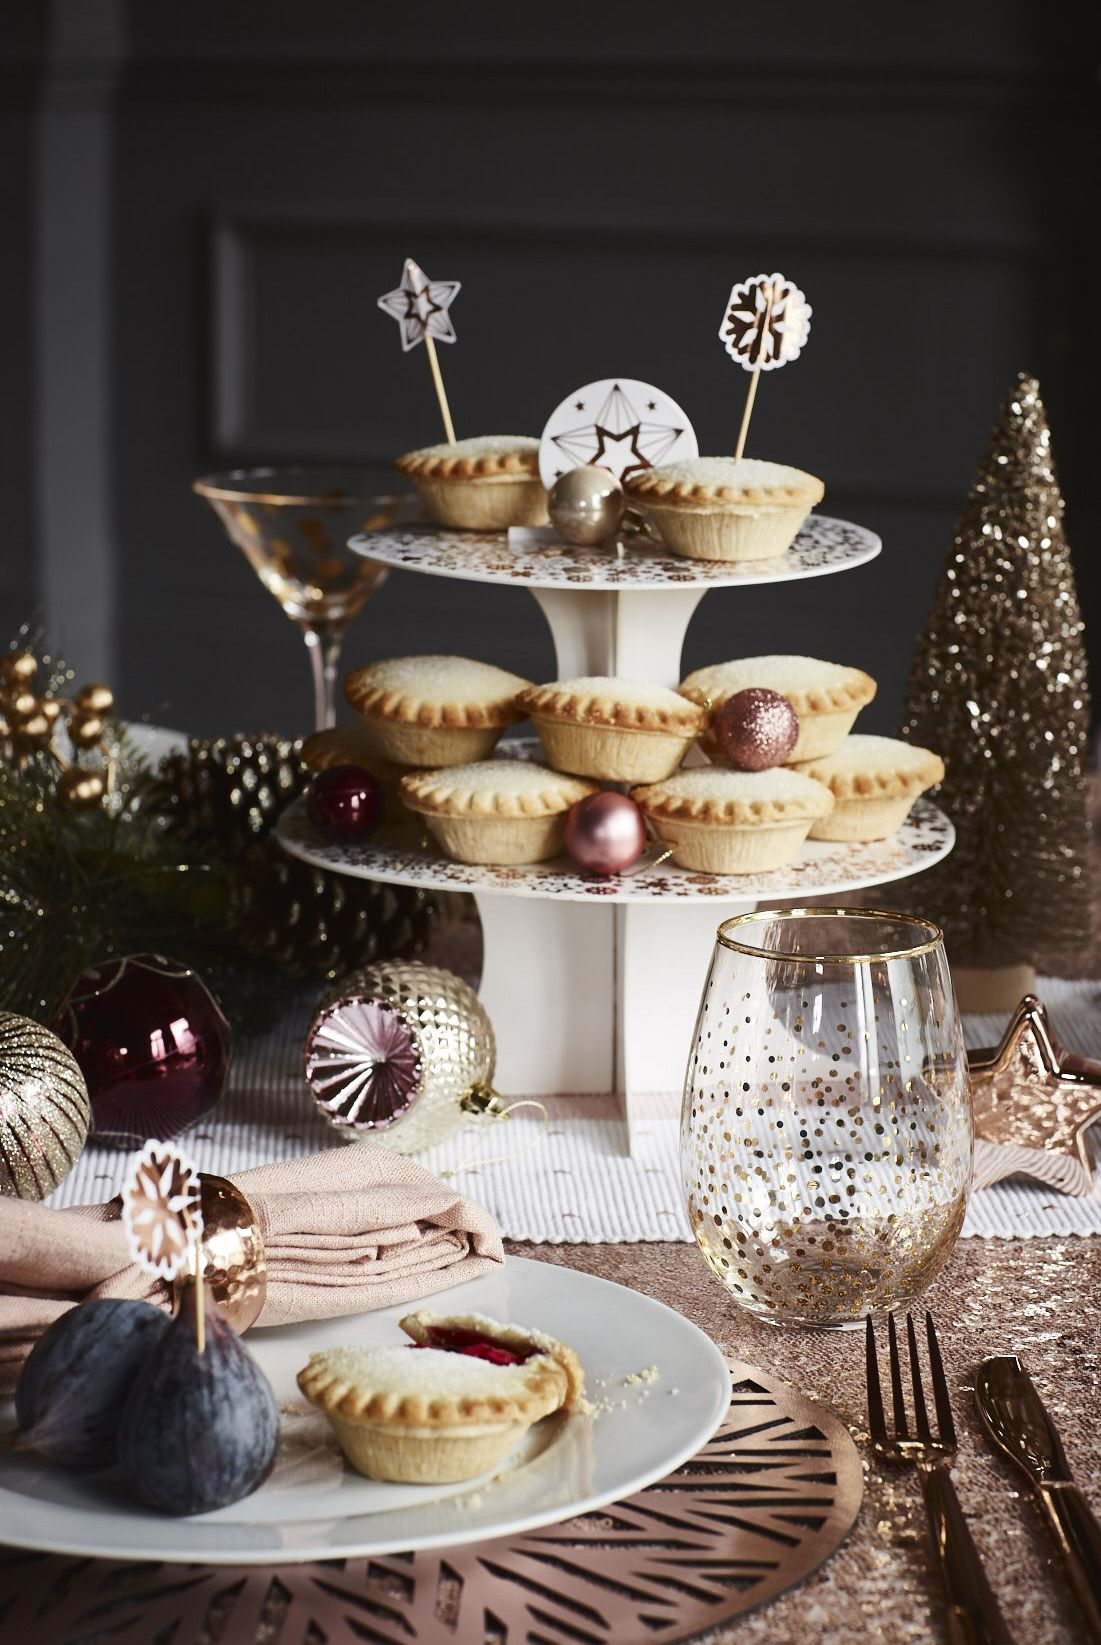 Primark Weihnachtsdeko.Primark Christmas Dining 2017 Christmas Is Coming Joulua